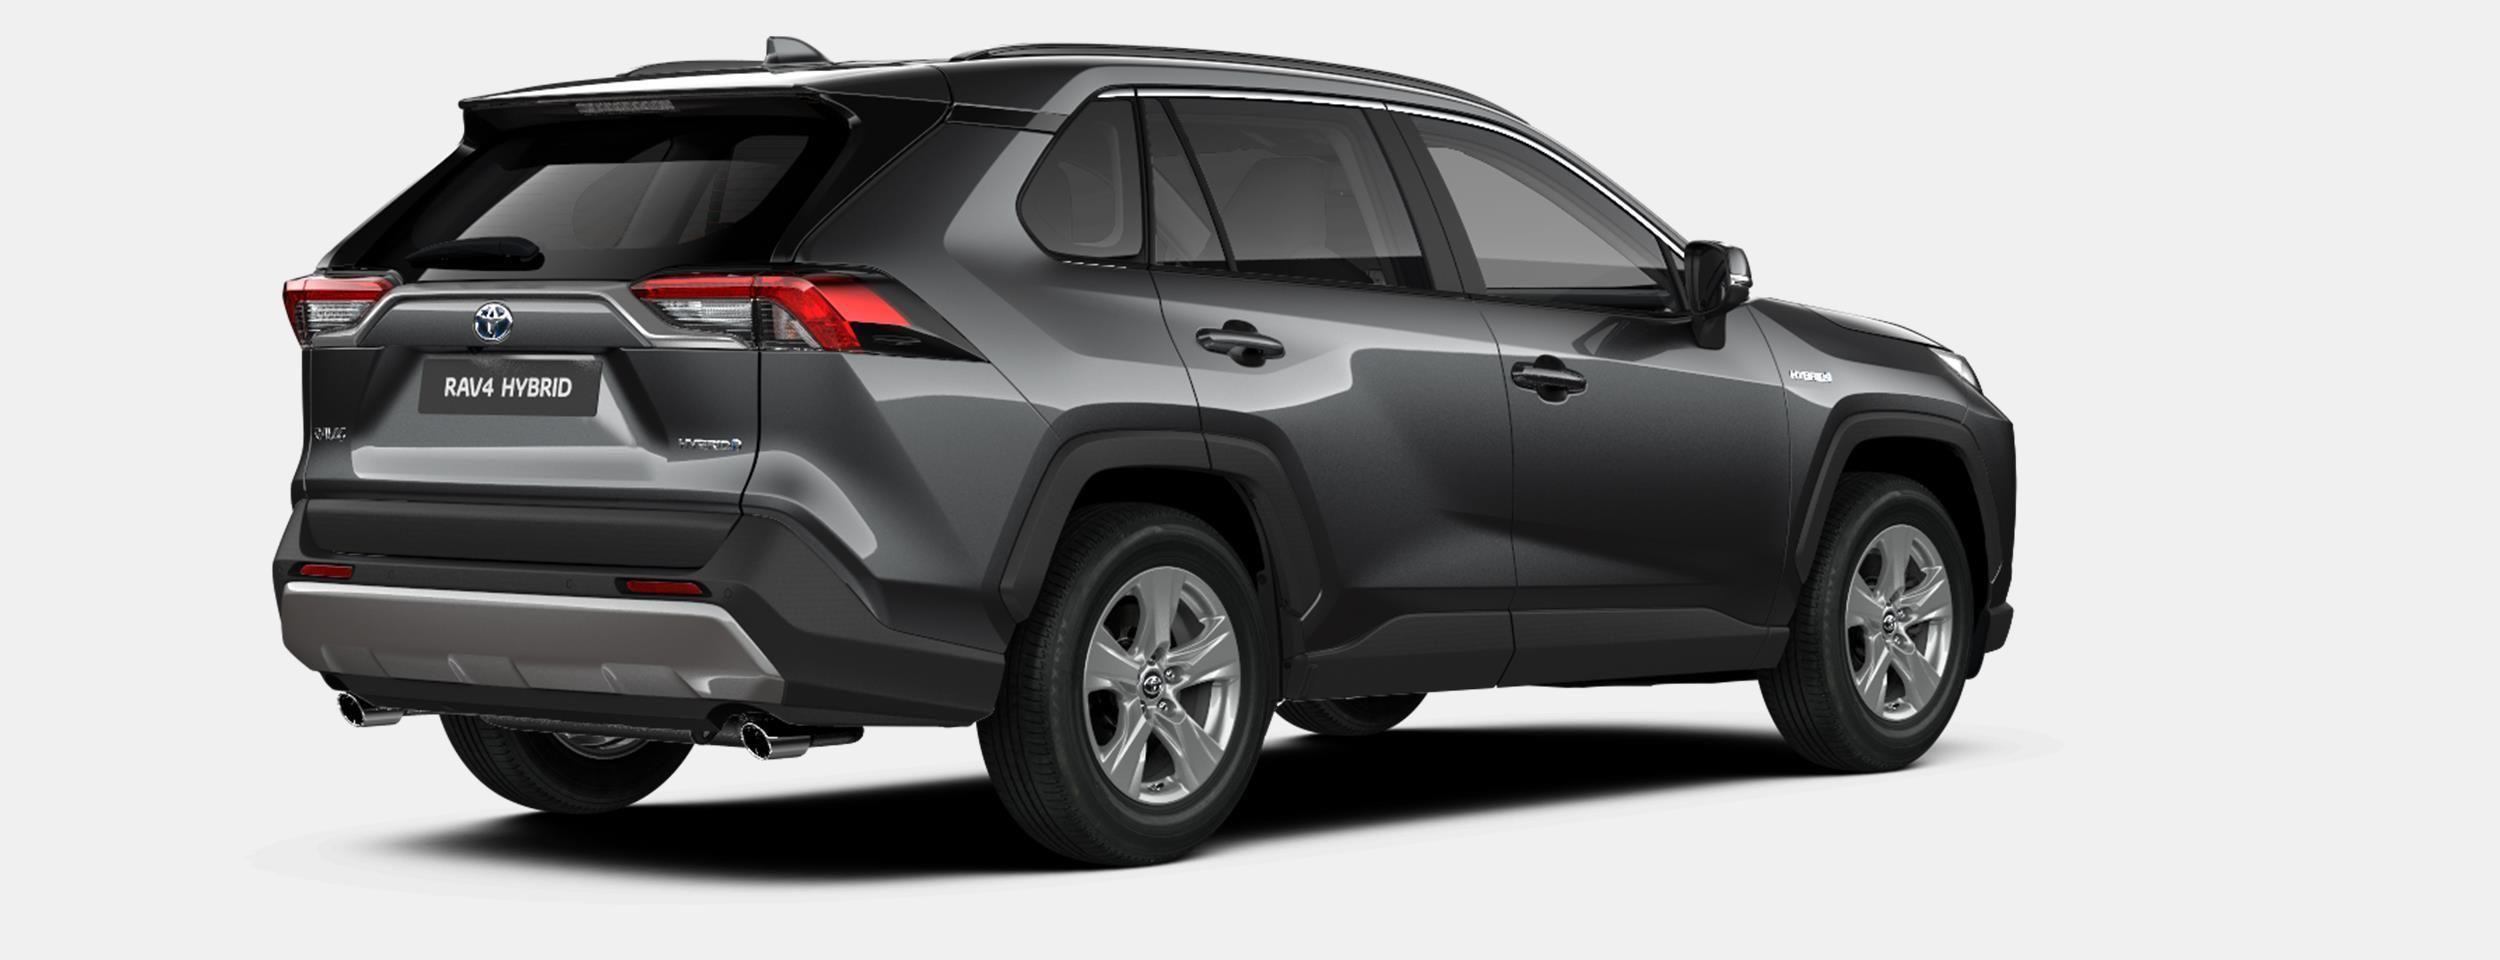 Nieuw Toyota Rav4 5 d. 2.5 Hybrid 2WD e-CVT Premium Plus L 1G3 - DARK GREY METALLIC 5